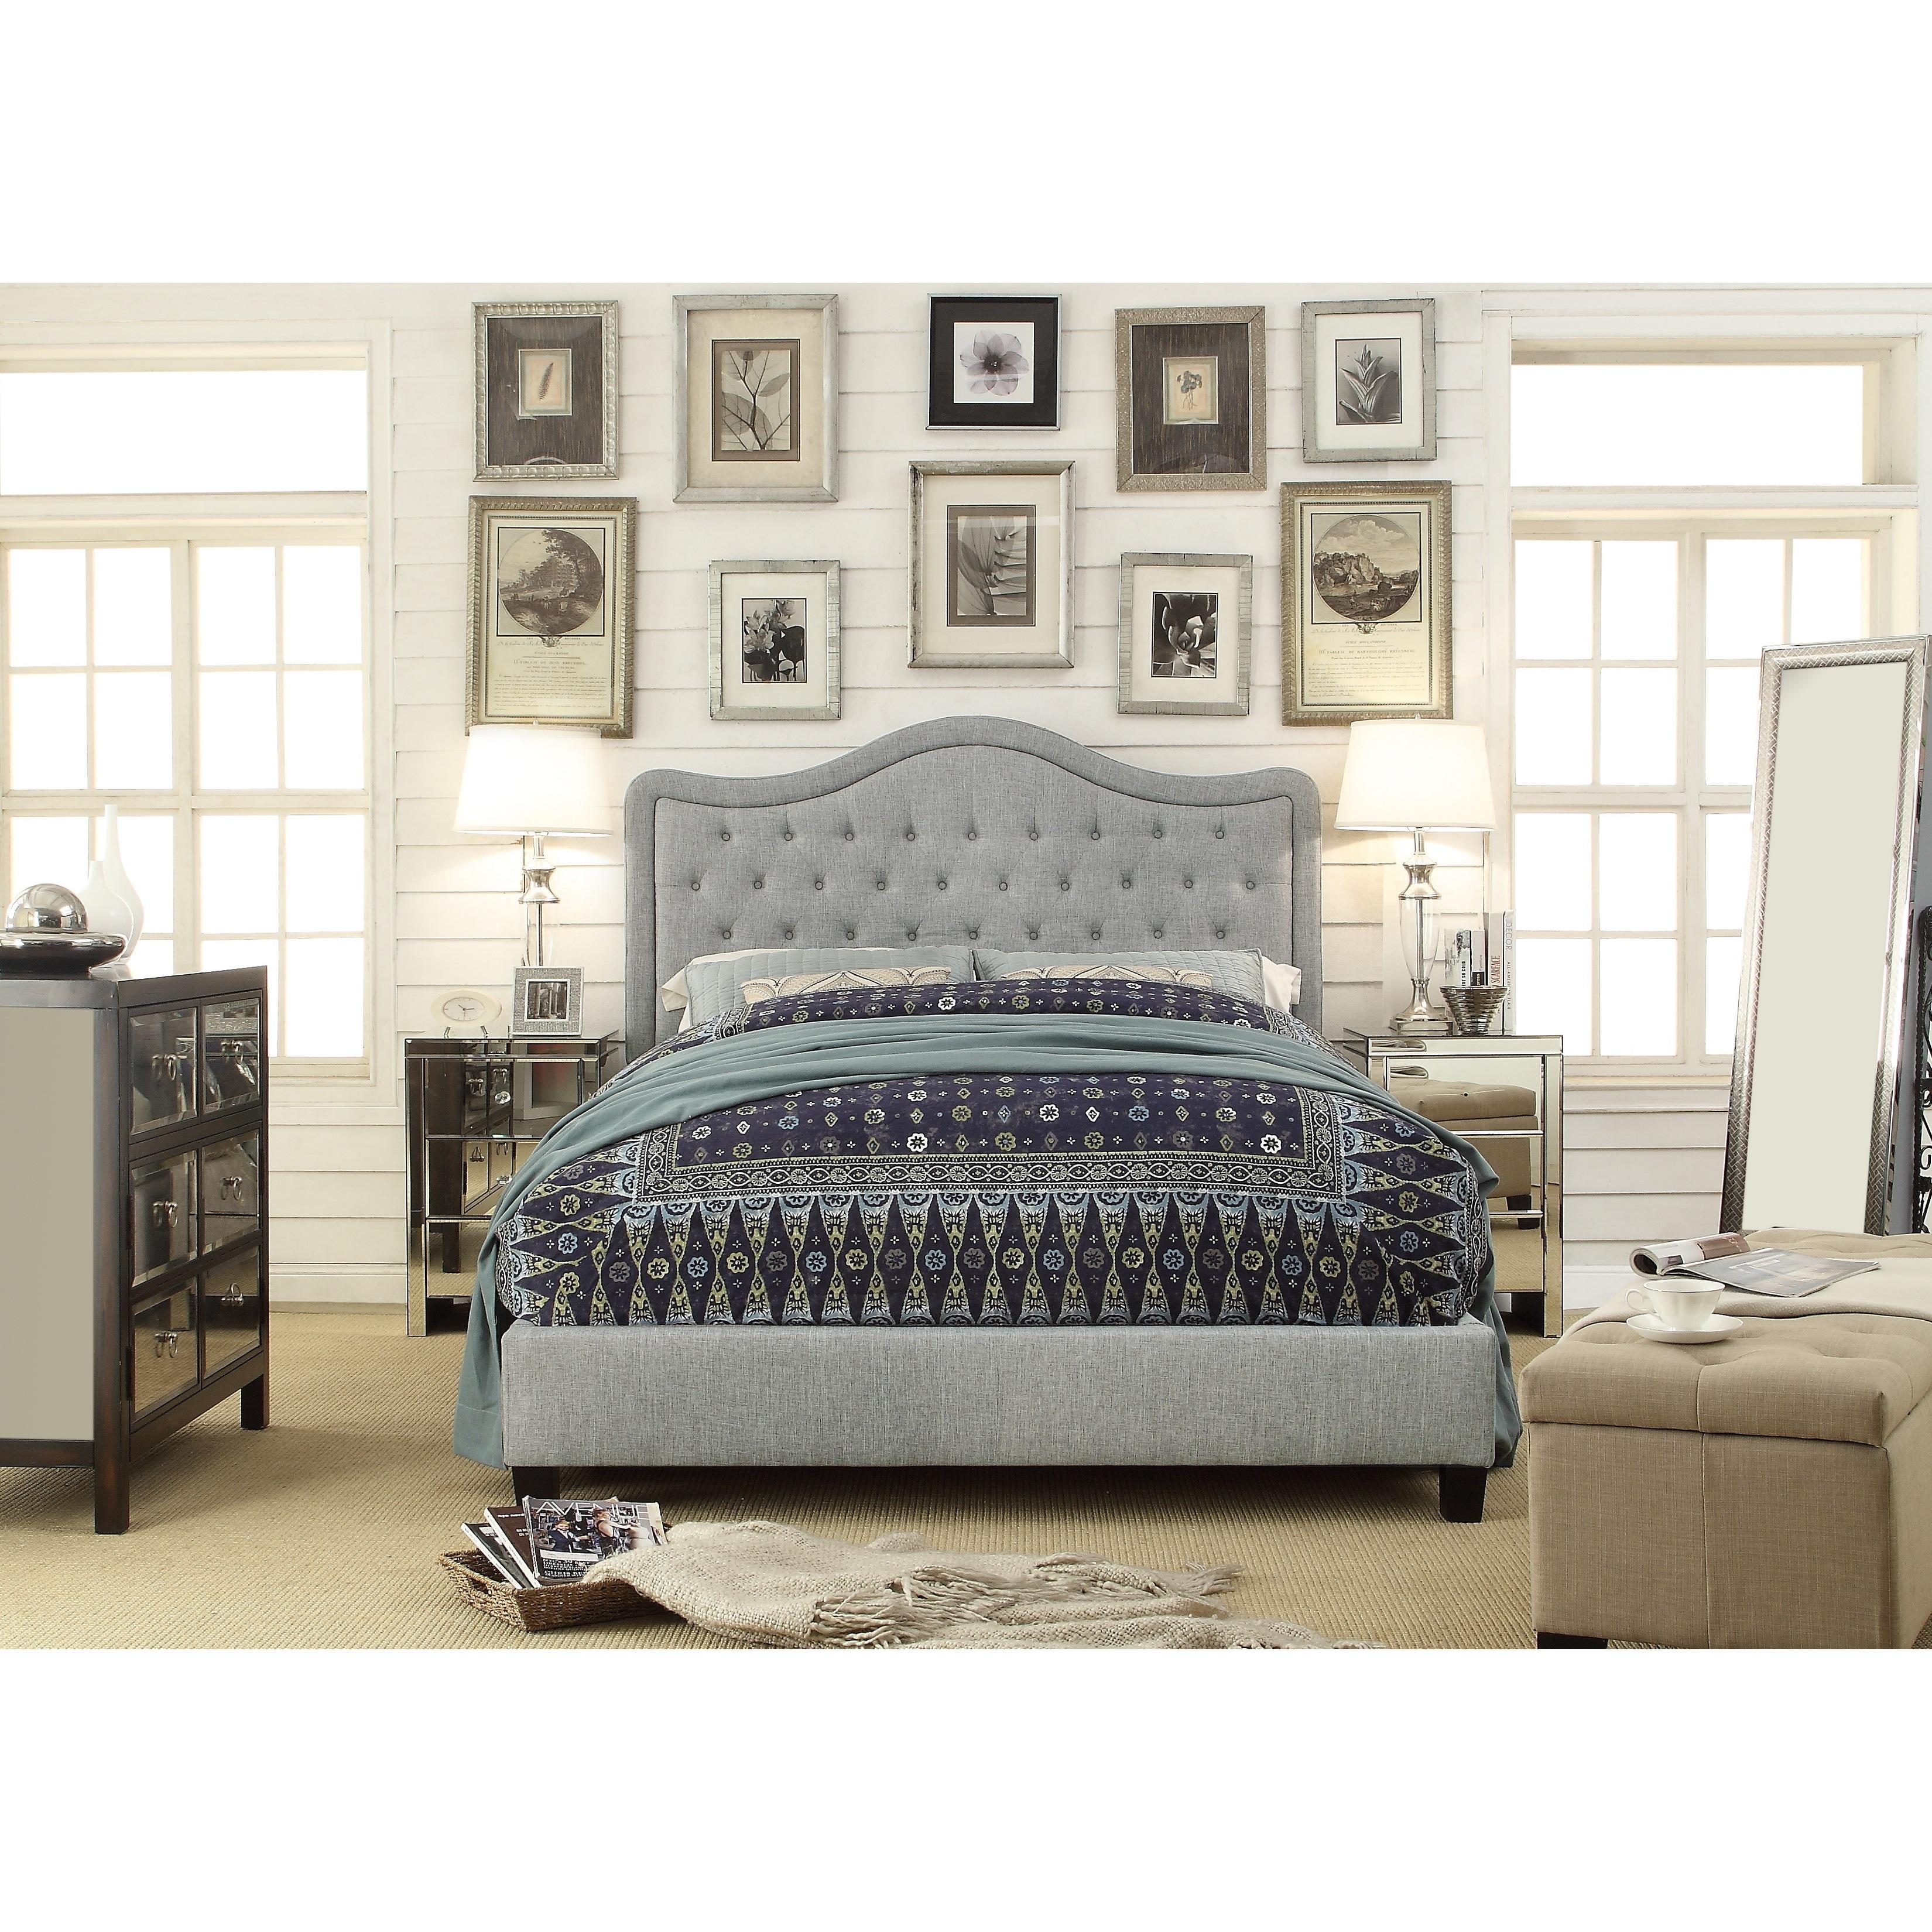 Moser Bay Furniture Adella Queen Size Linen Grey Waved Top Platform Bed Overstock 10389411